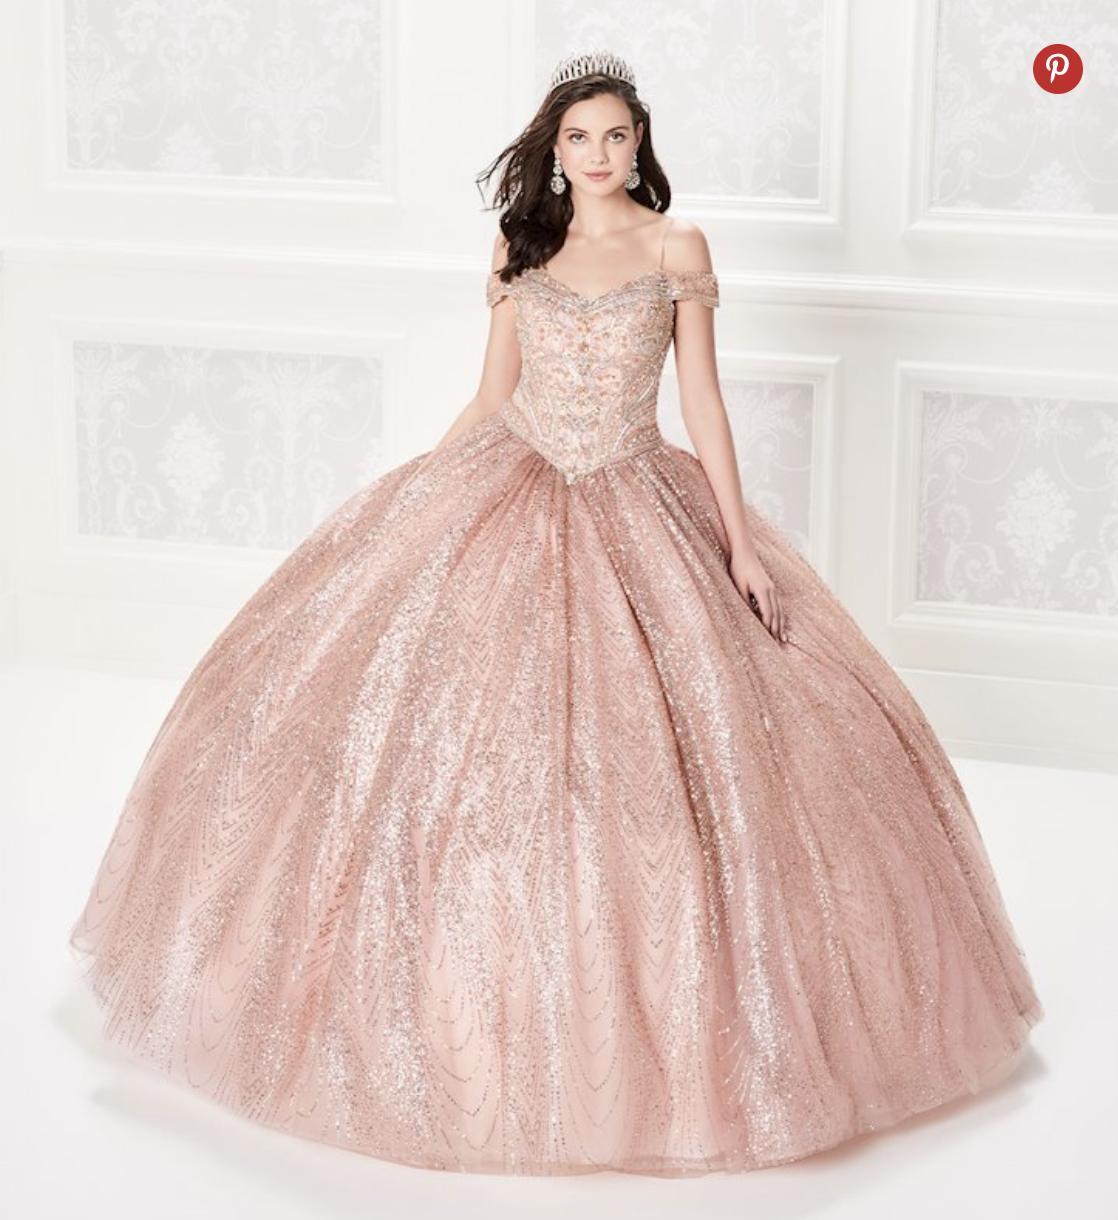 Princesa By Ariana Vara PR21958